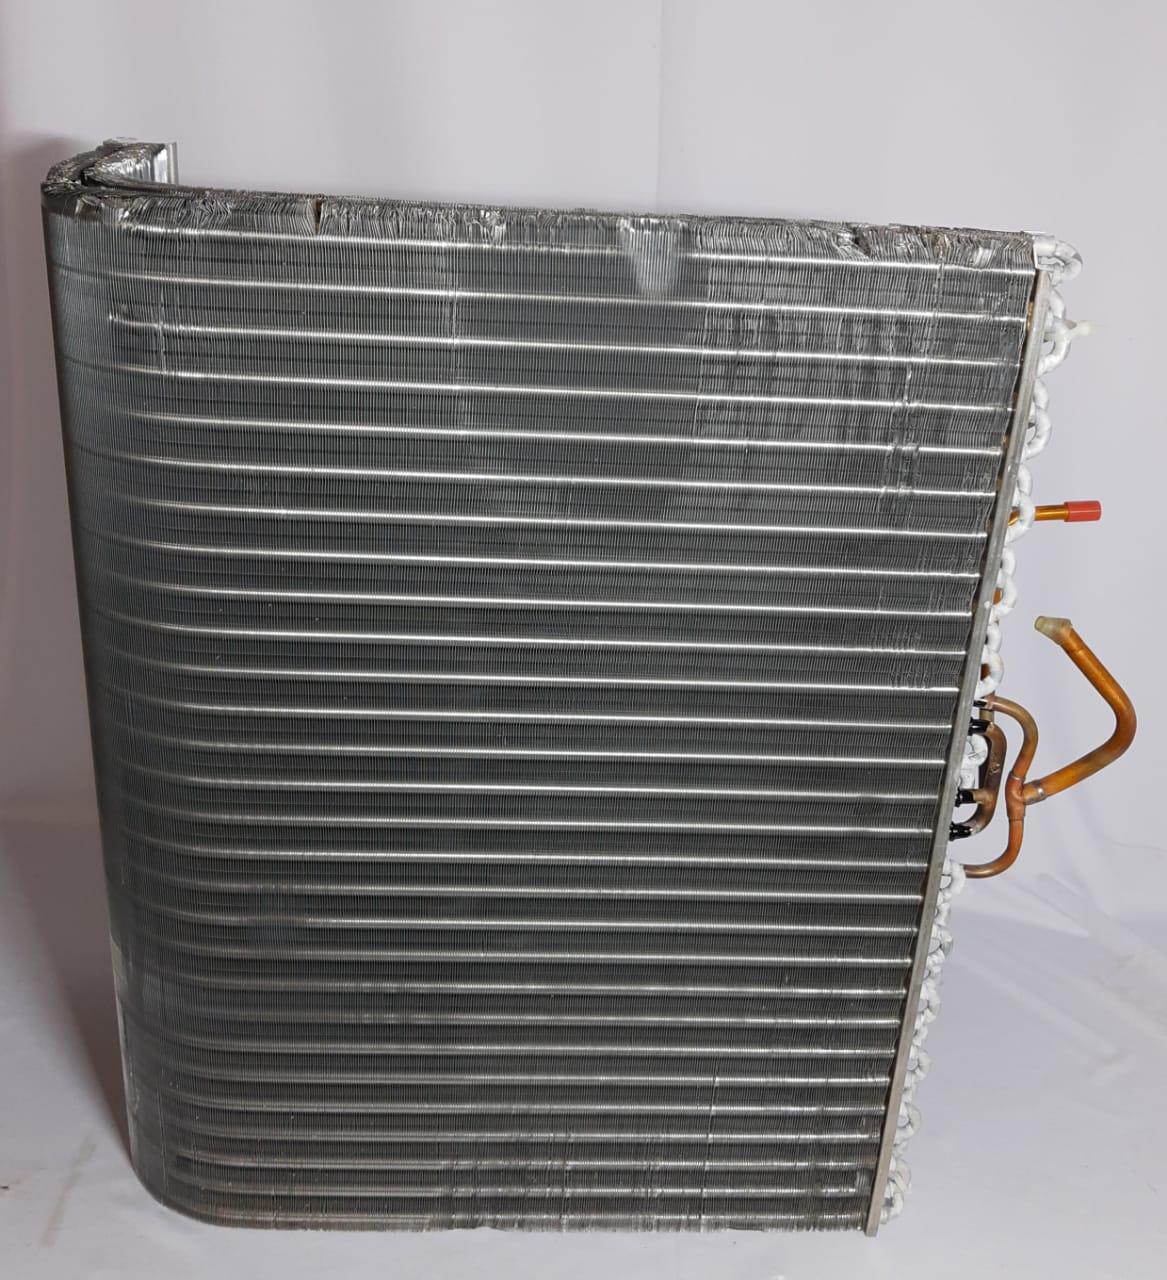 Serpentina Condensadora 36000 Btus Fria Eco Elgin